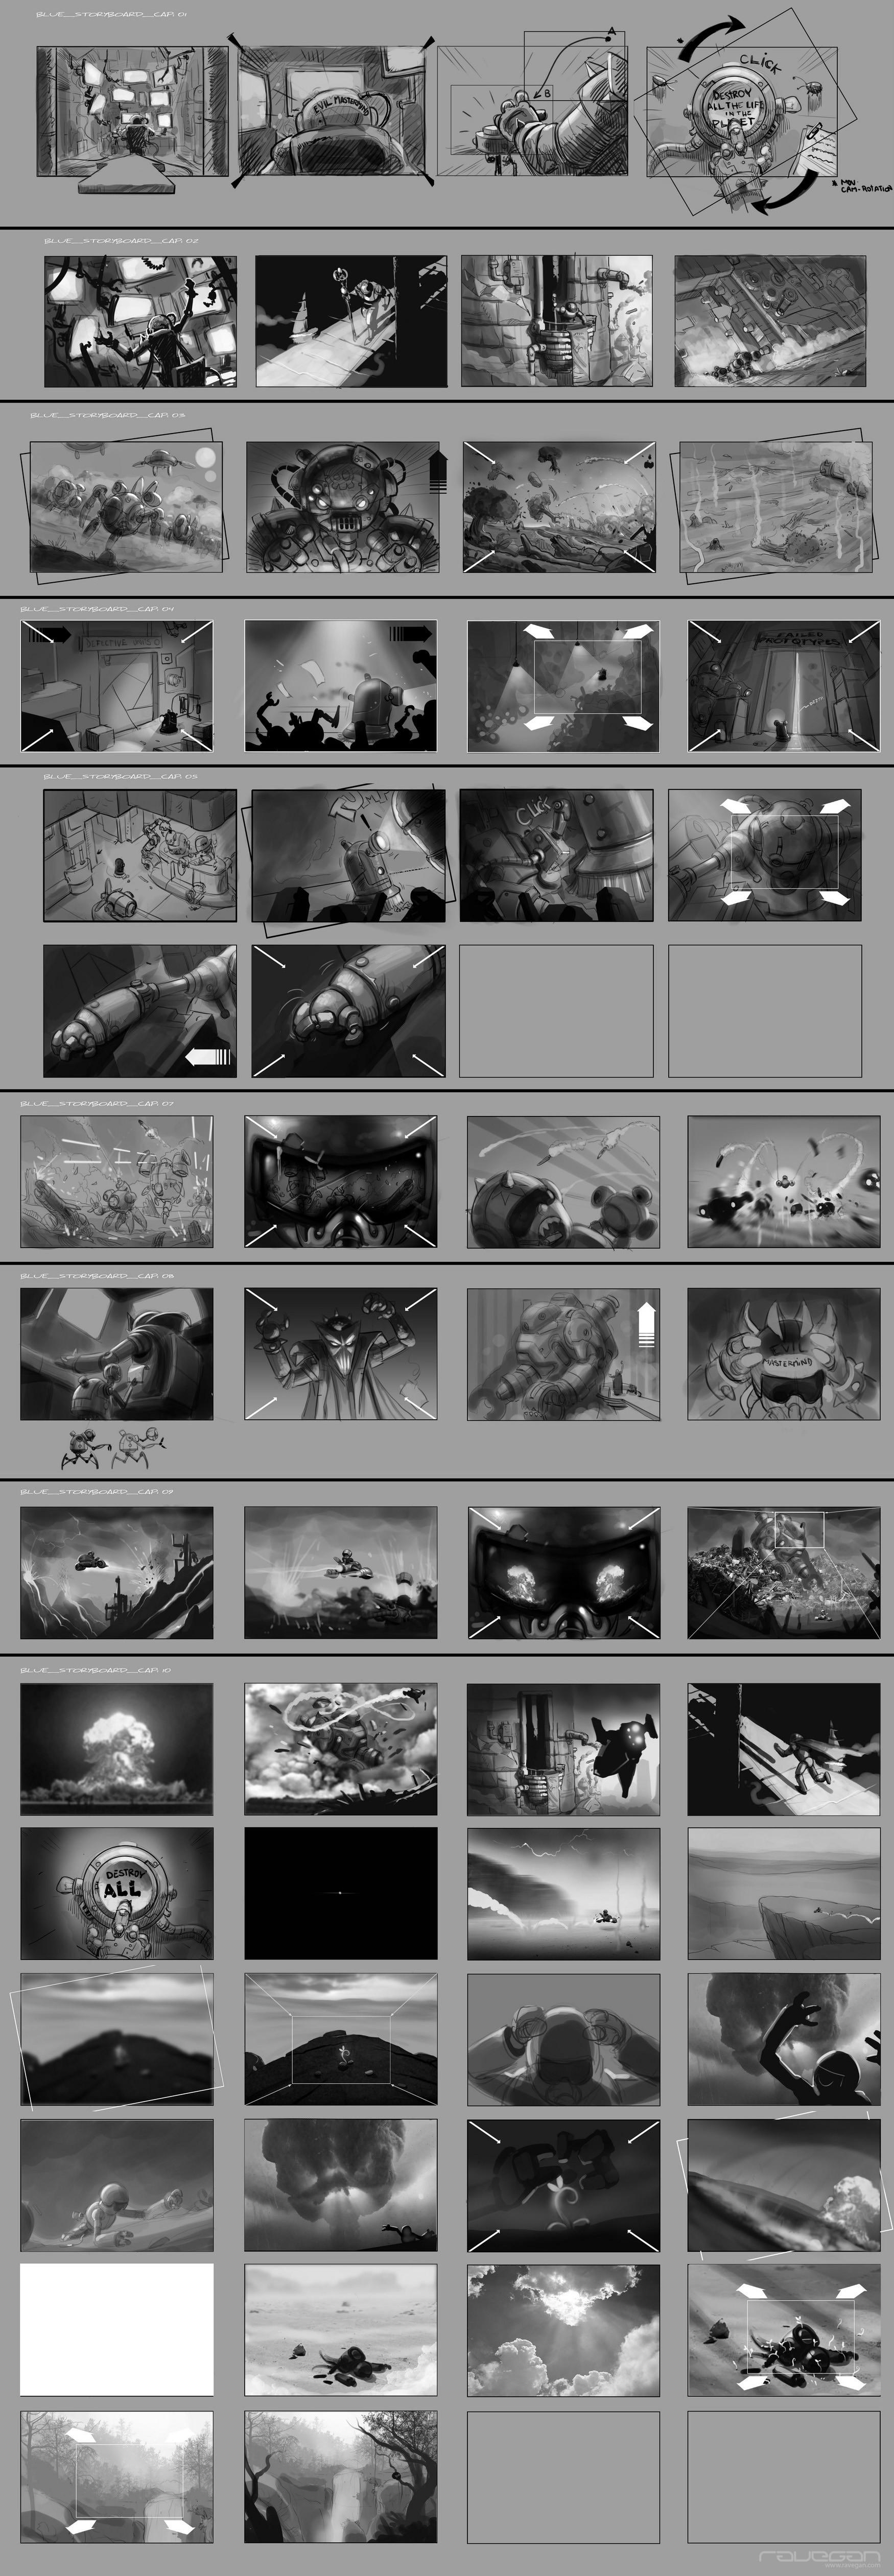 Ravegan games br storyboards